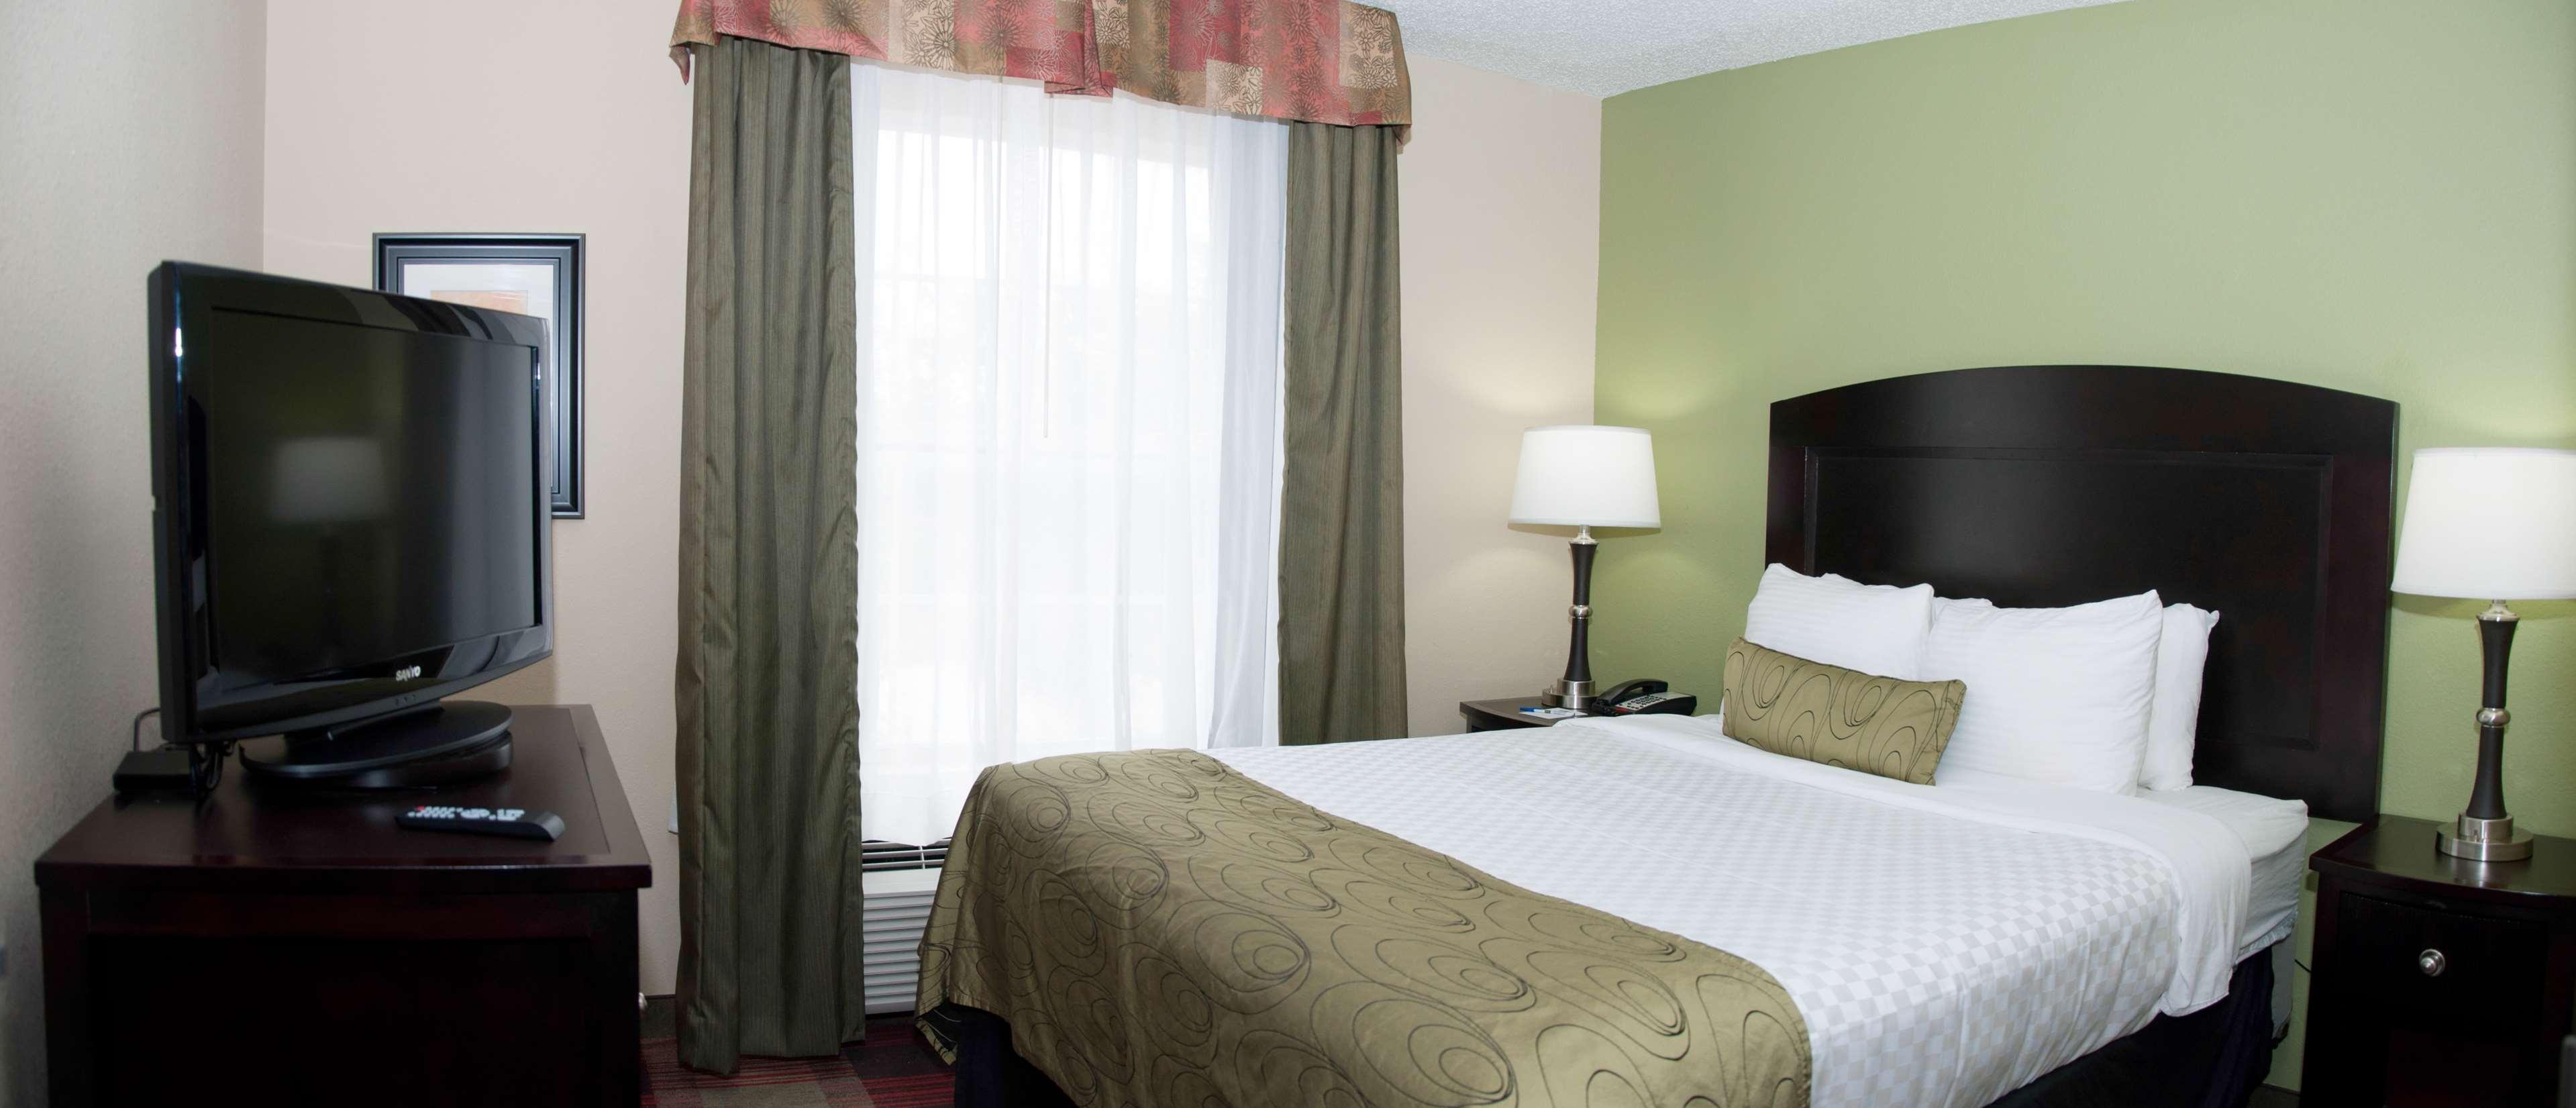 Best Western Plus Addison/Dallas Hotel image 20